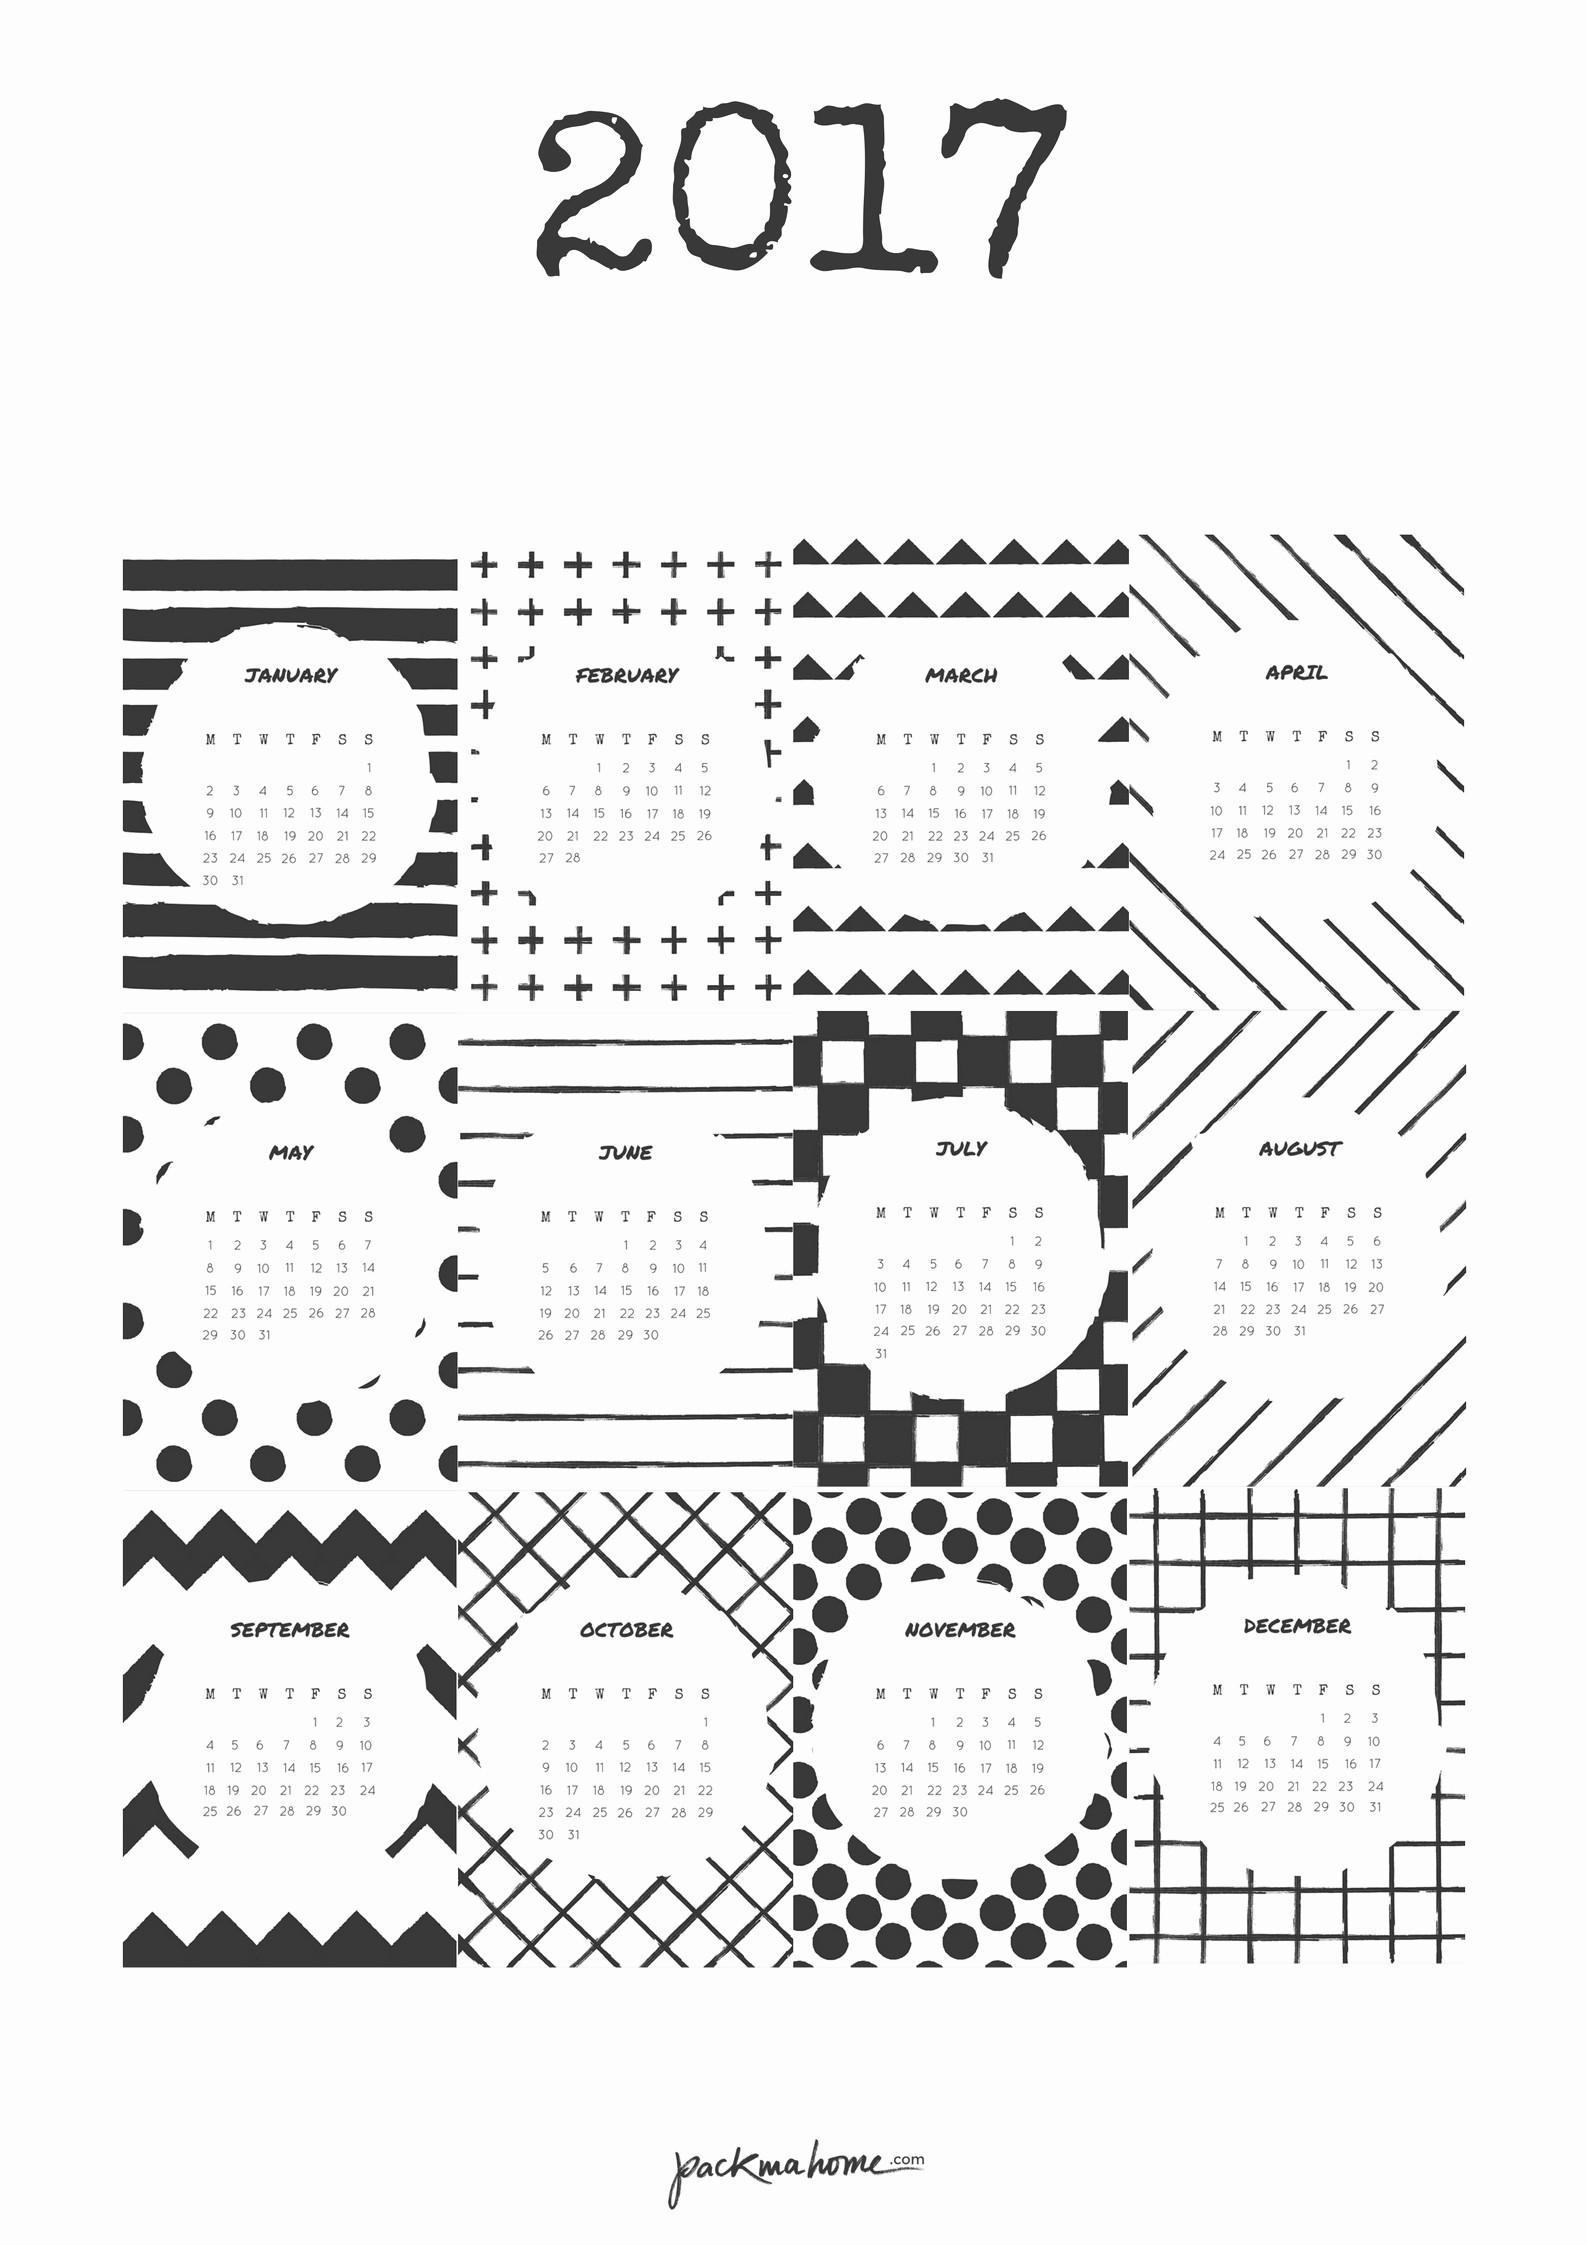 Kalender 2016 Zum Ausdrucken Neu Free Printable 2017 Calendar